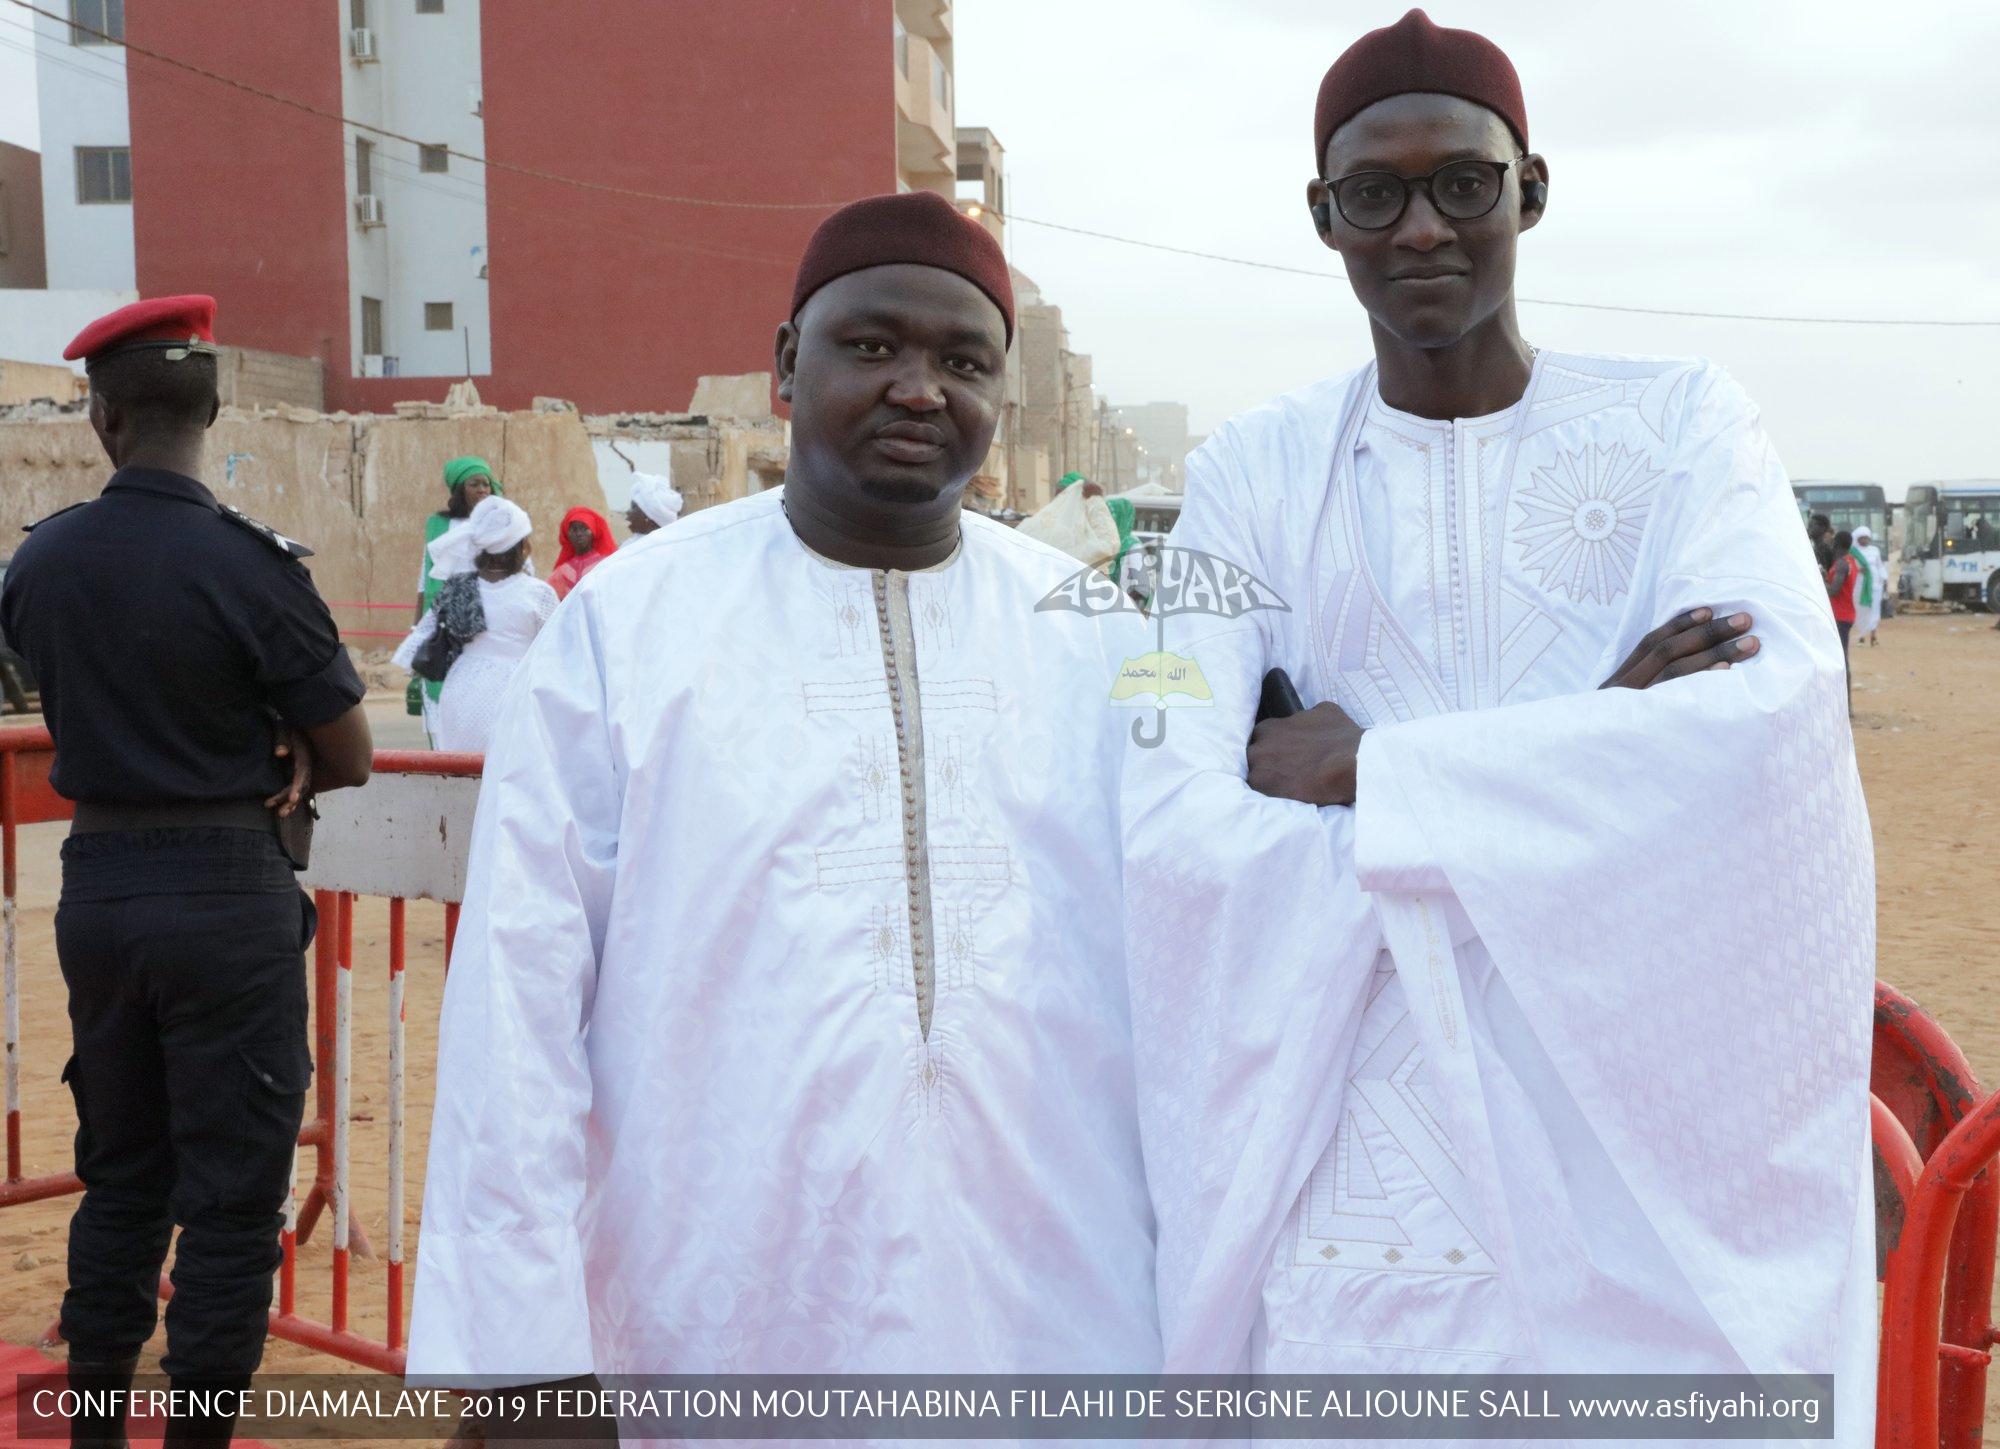 PHOTOS - DIAMALAYE 2019 - Les Images de la Conférence de la Federation Moutahabina Filahi de Serigne Alioune Sall Safietou SY